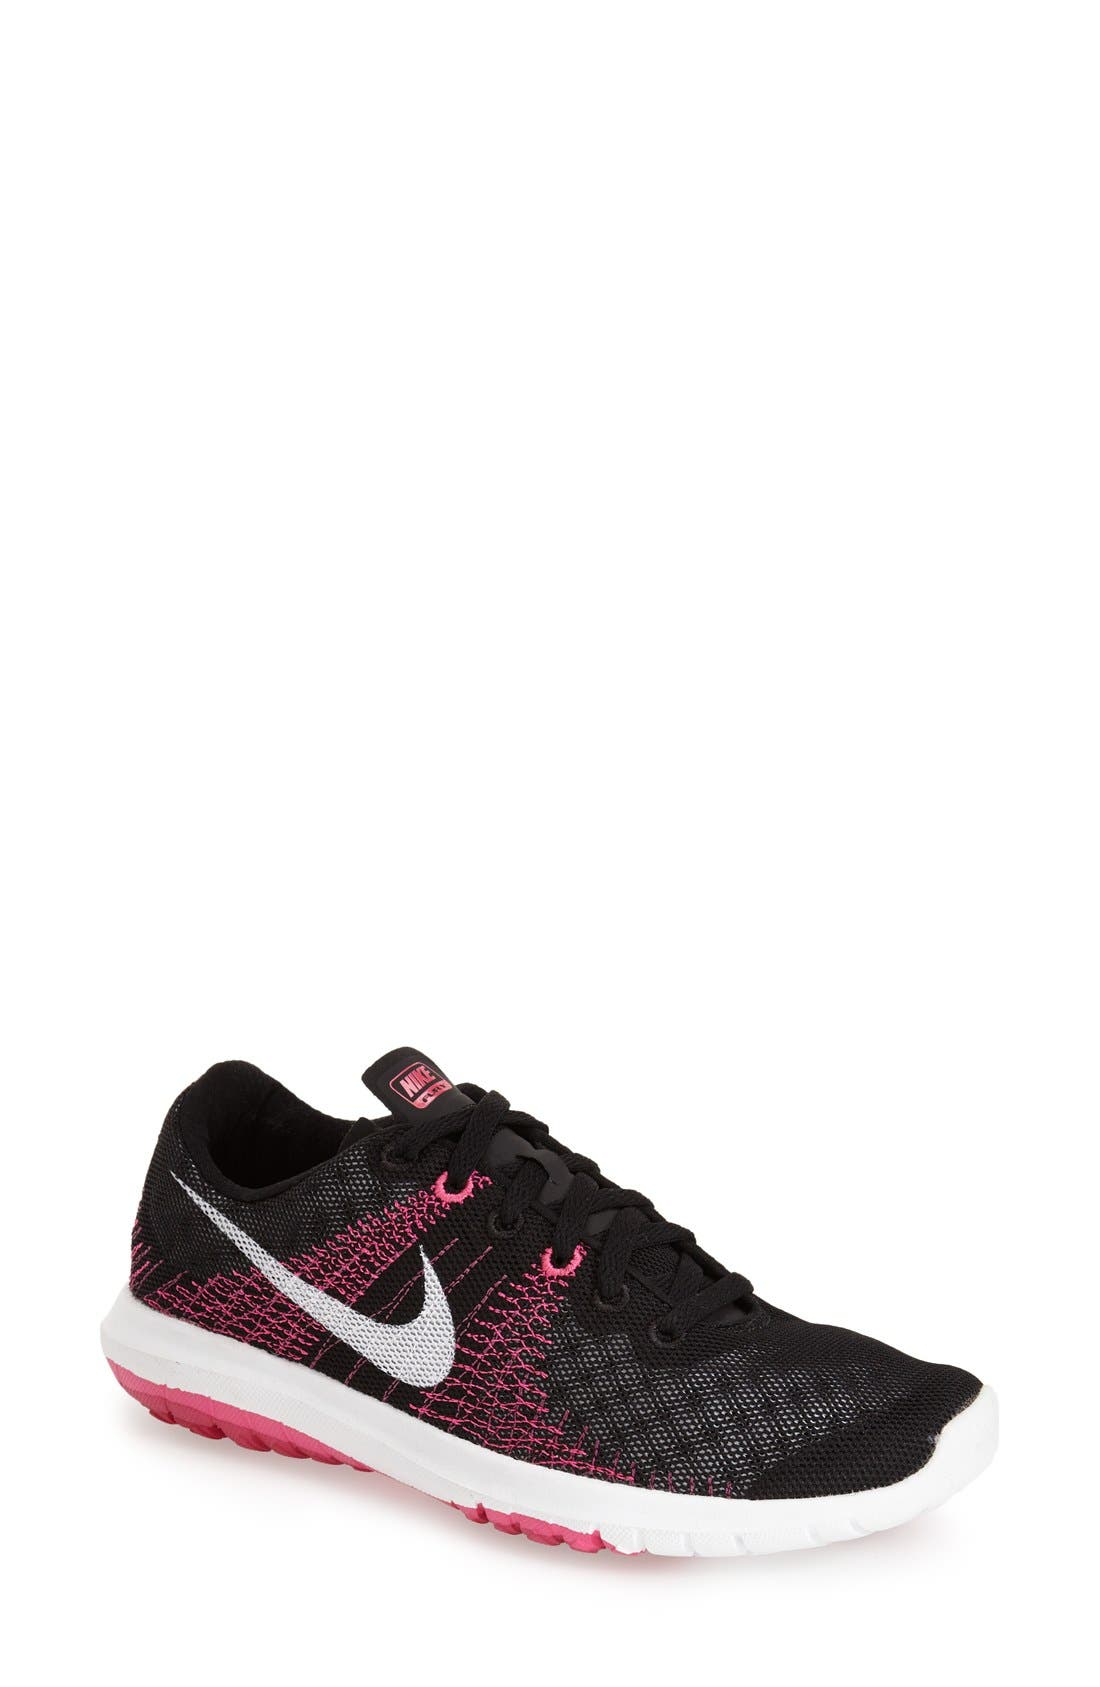 Alternate Image 1 Selected - Nike 'Flex Fury' Running Shoe (Women)